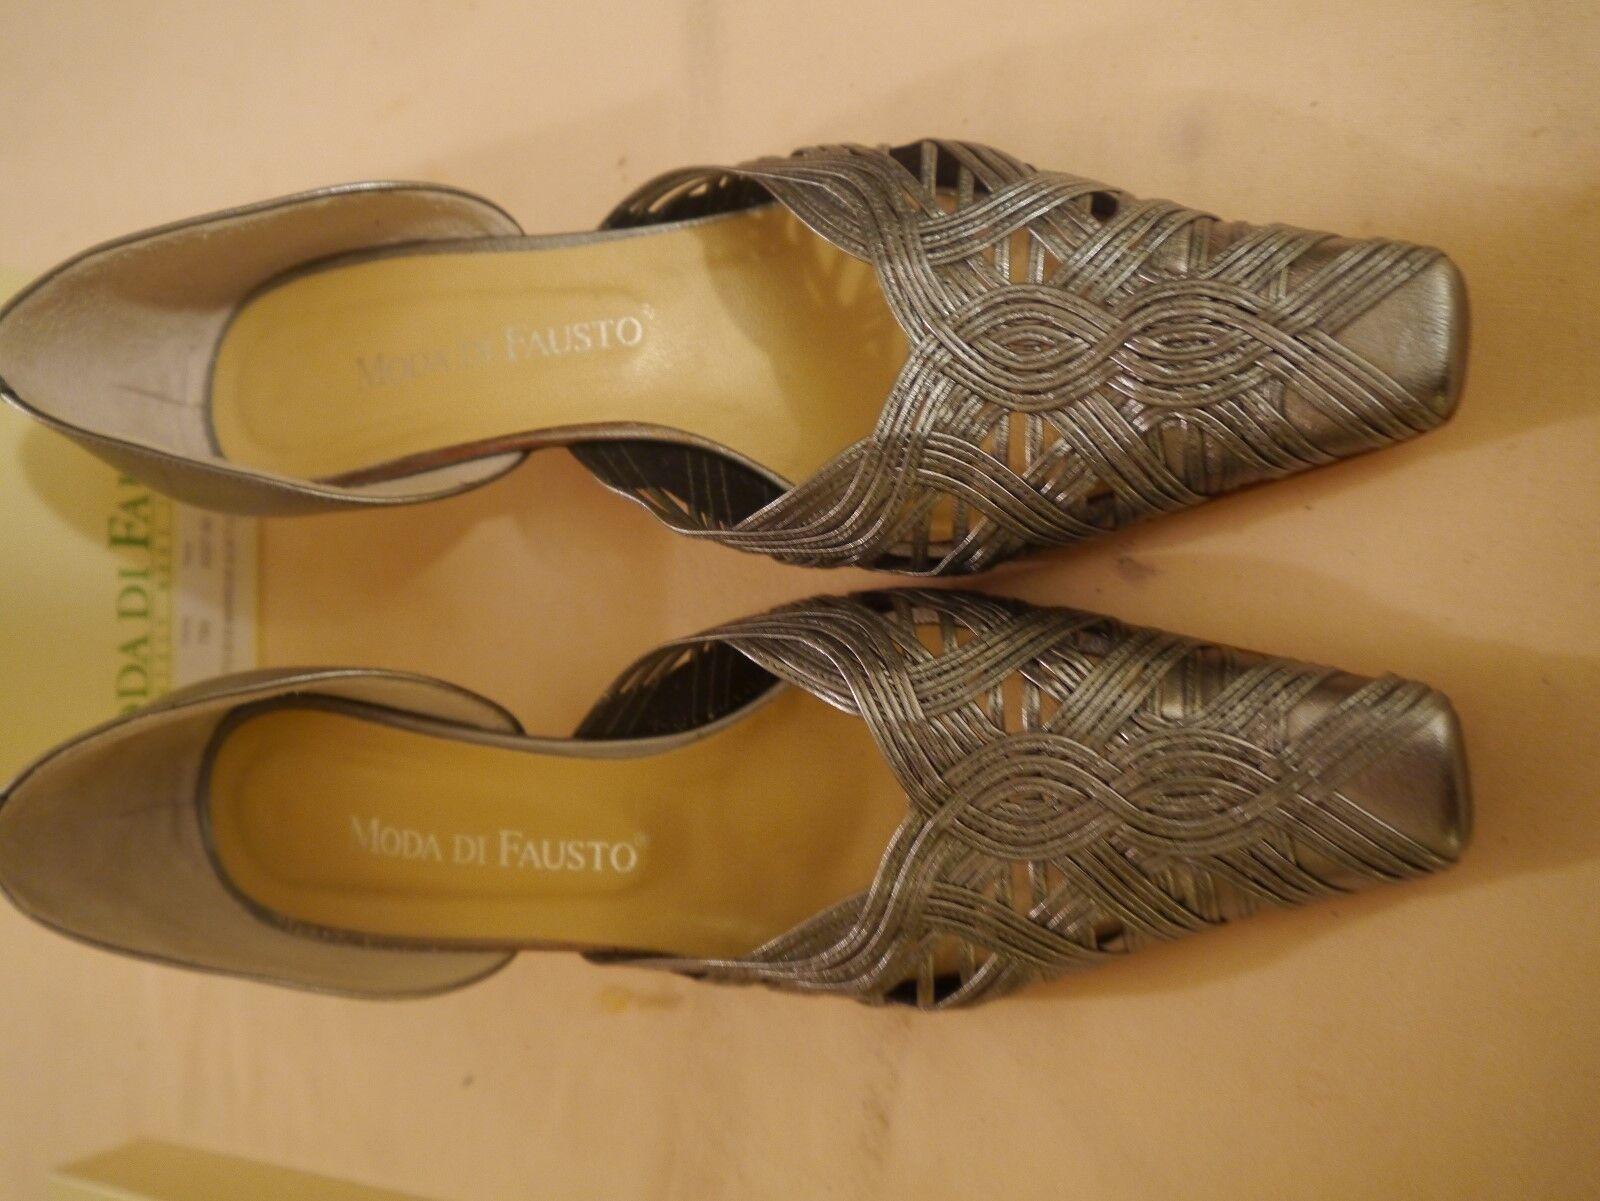 Moda di Fausto ladies chaussures caprettu 615 mirror soft Taille 38 1 2 used with box